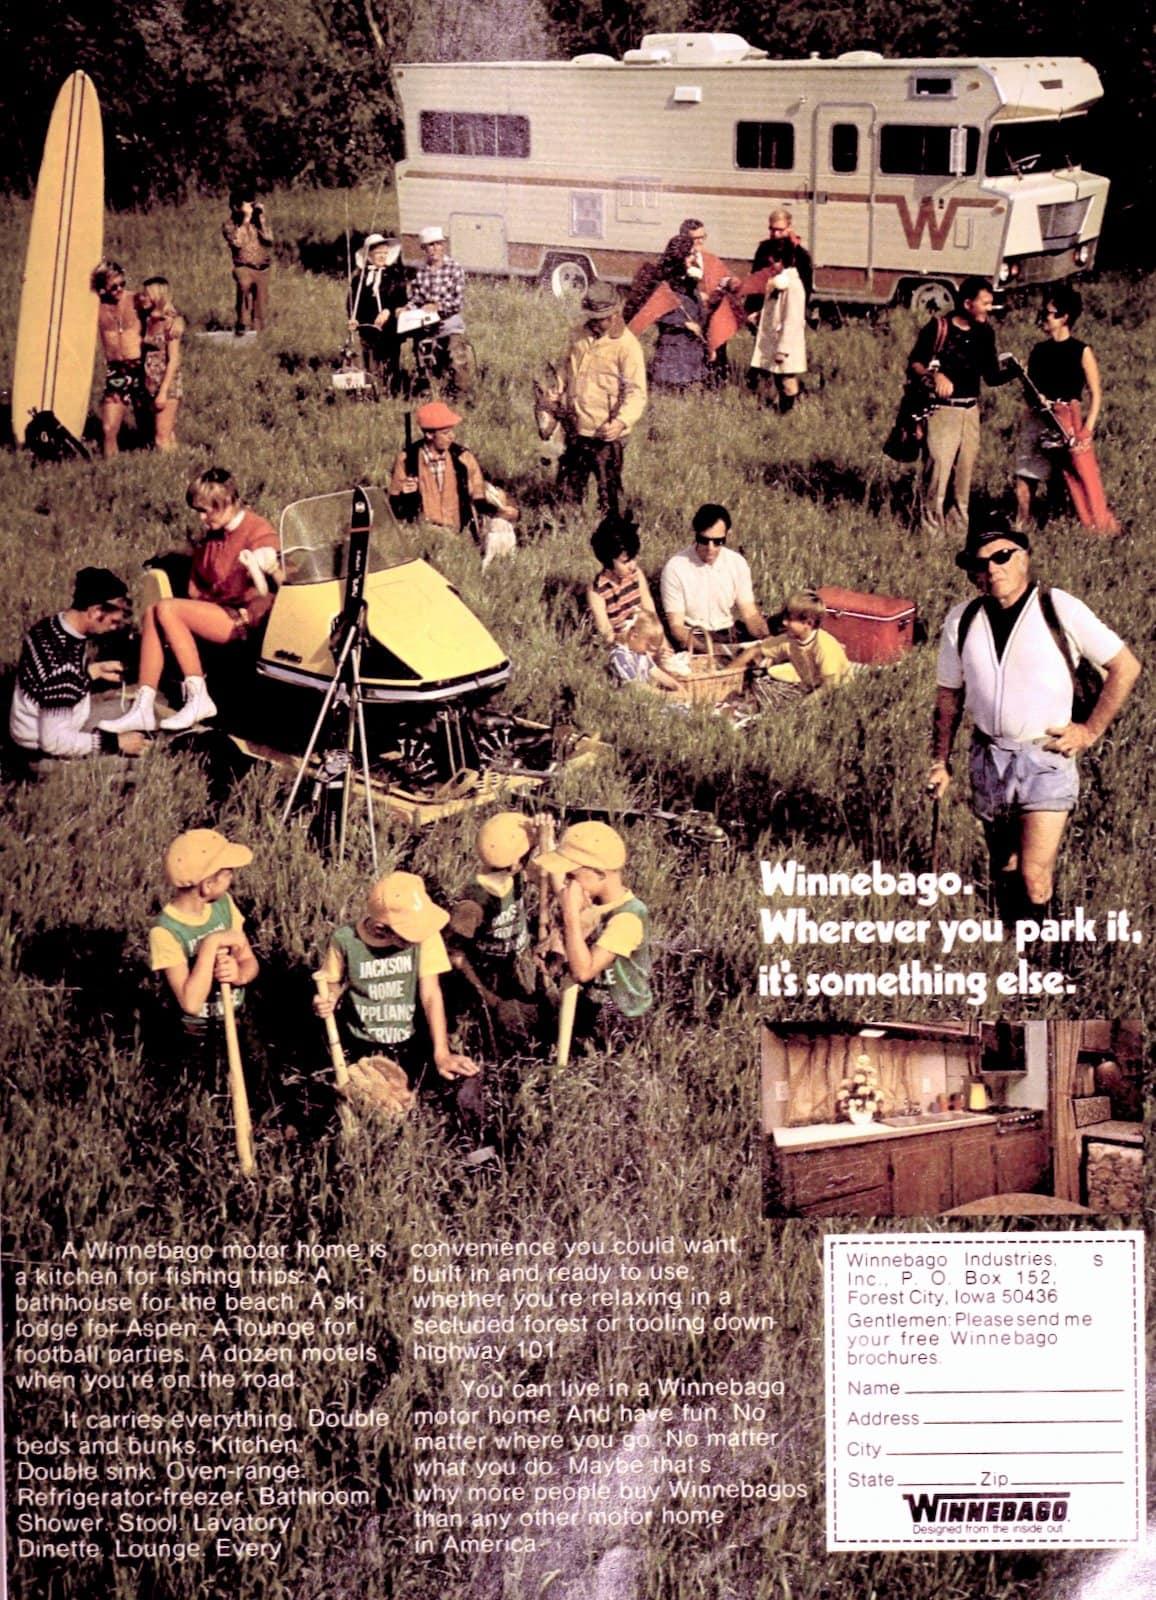 Camping fun in a vintage 70s Winnebago motor home RV